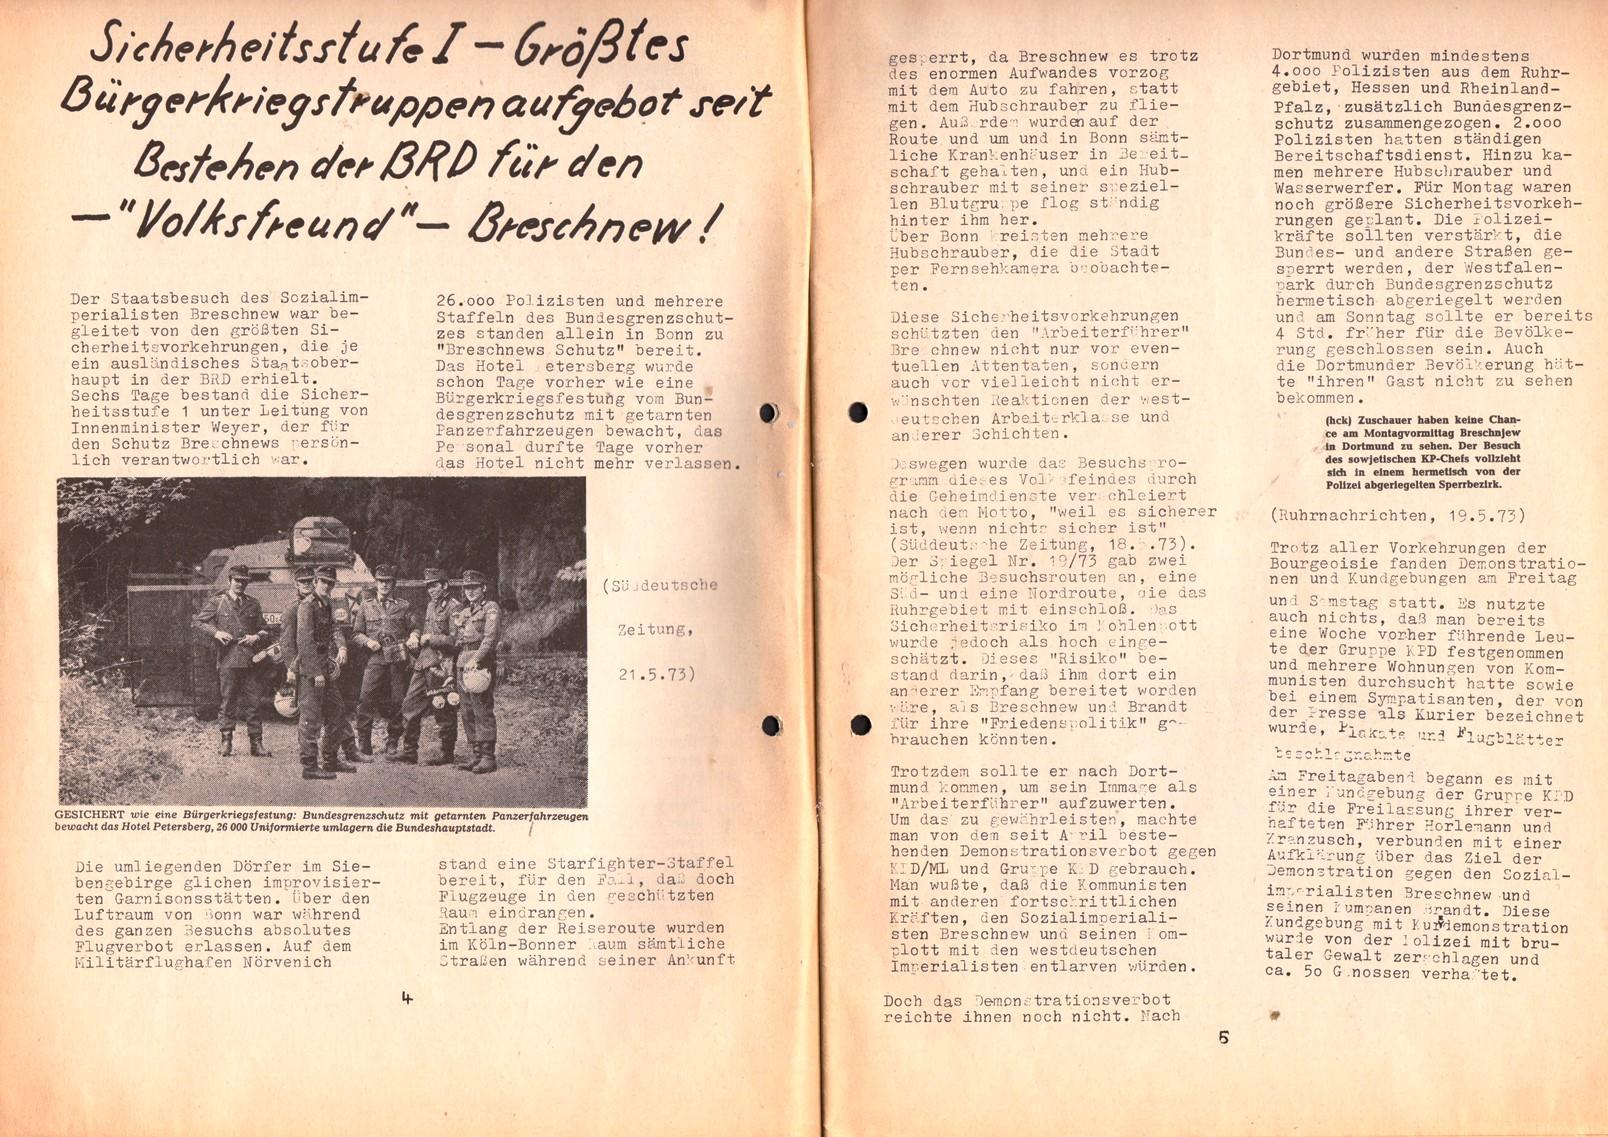 KPDML_1973_Breschnew_Besuch_in_Bonn_04